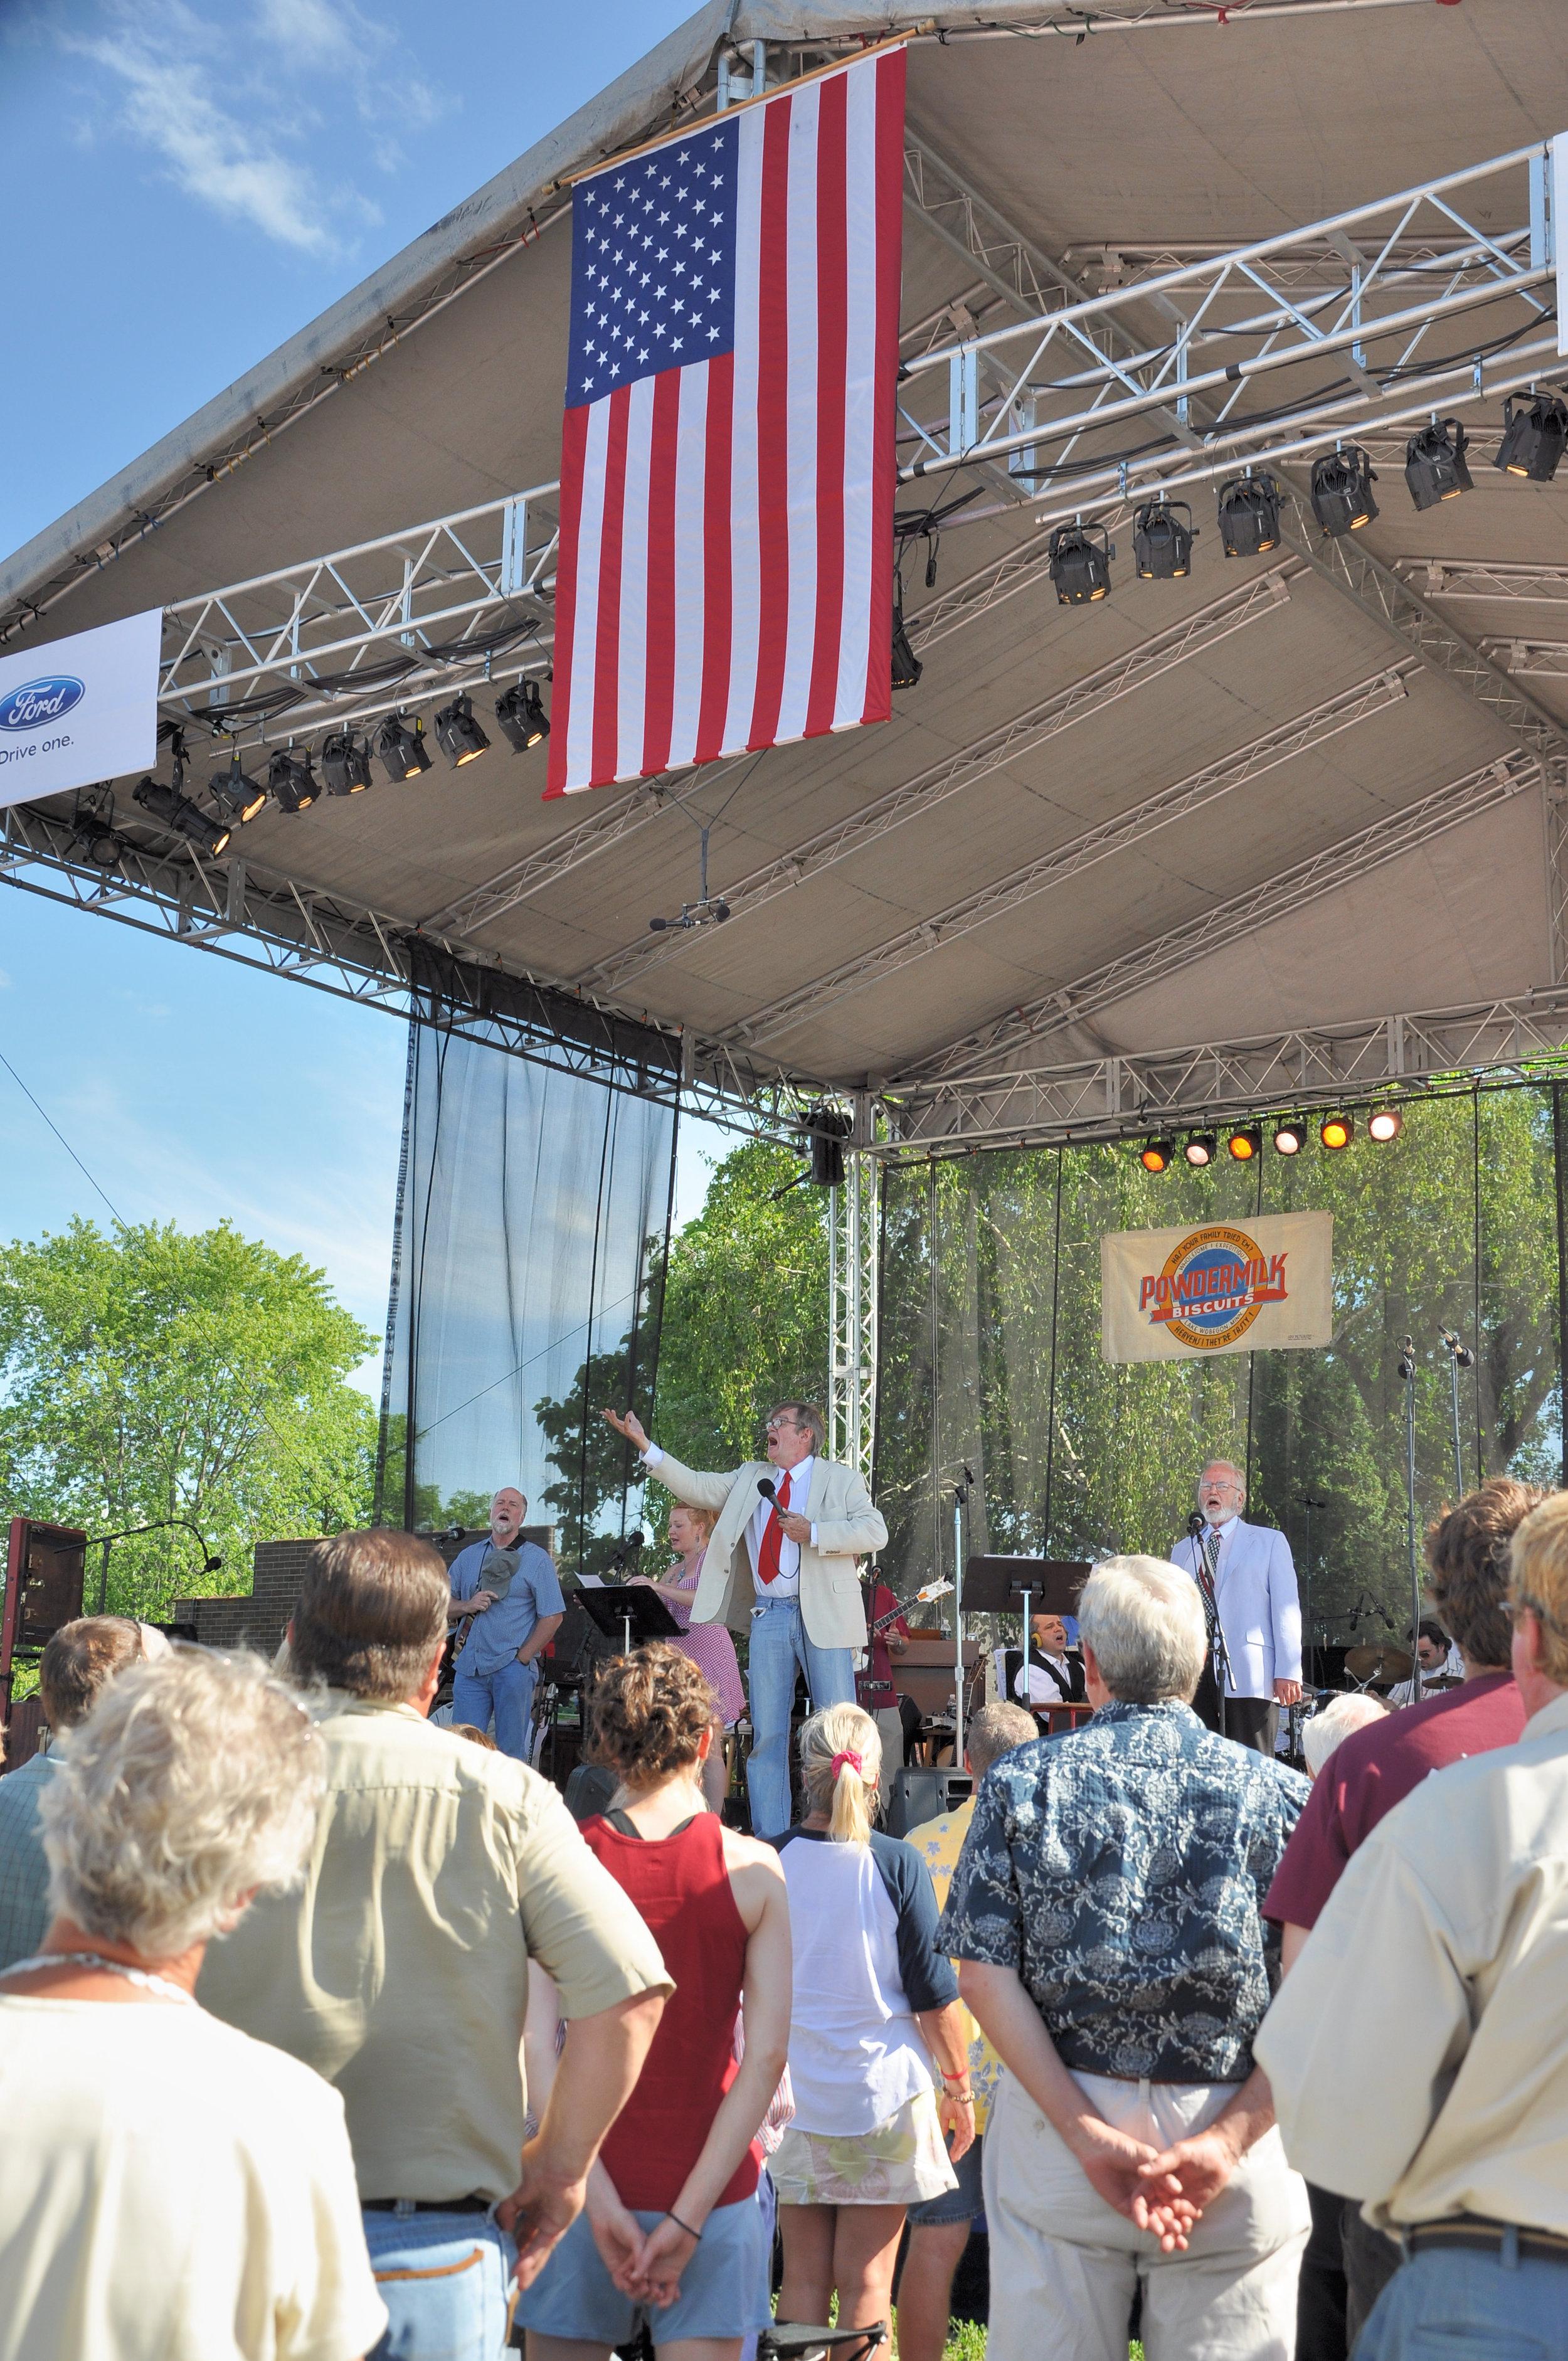 Garrison Keillor, Prairie Home Companion live radio broadcast from Avon, MN